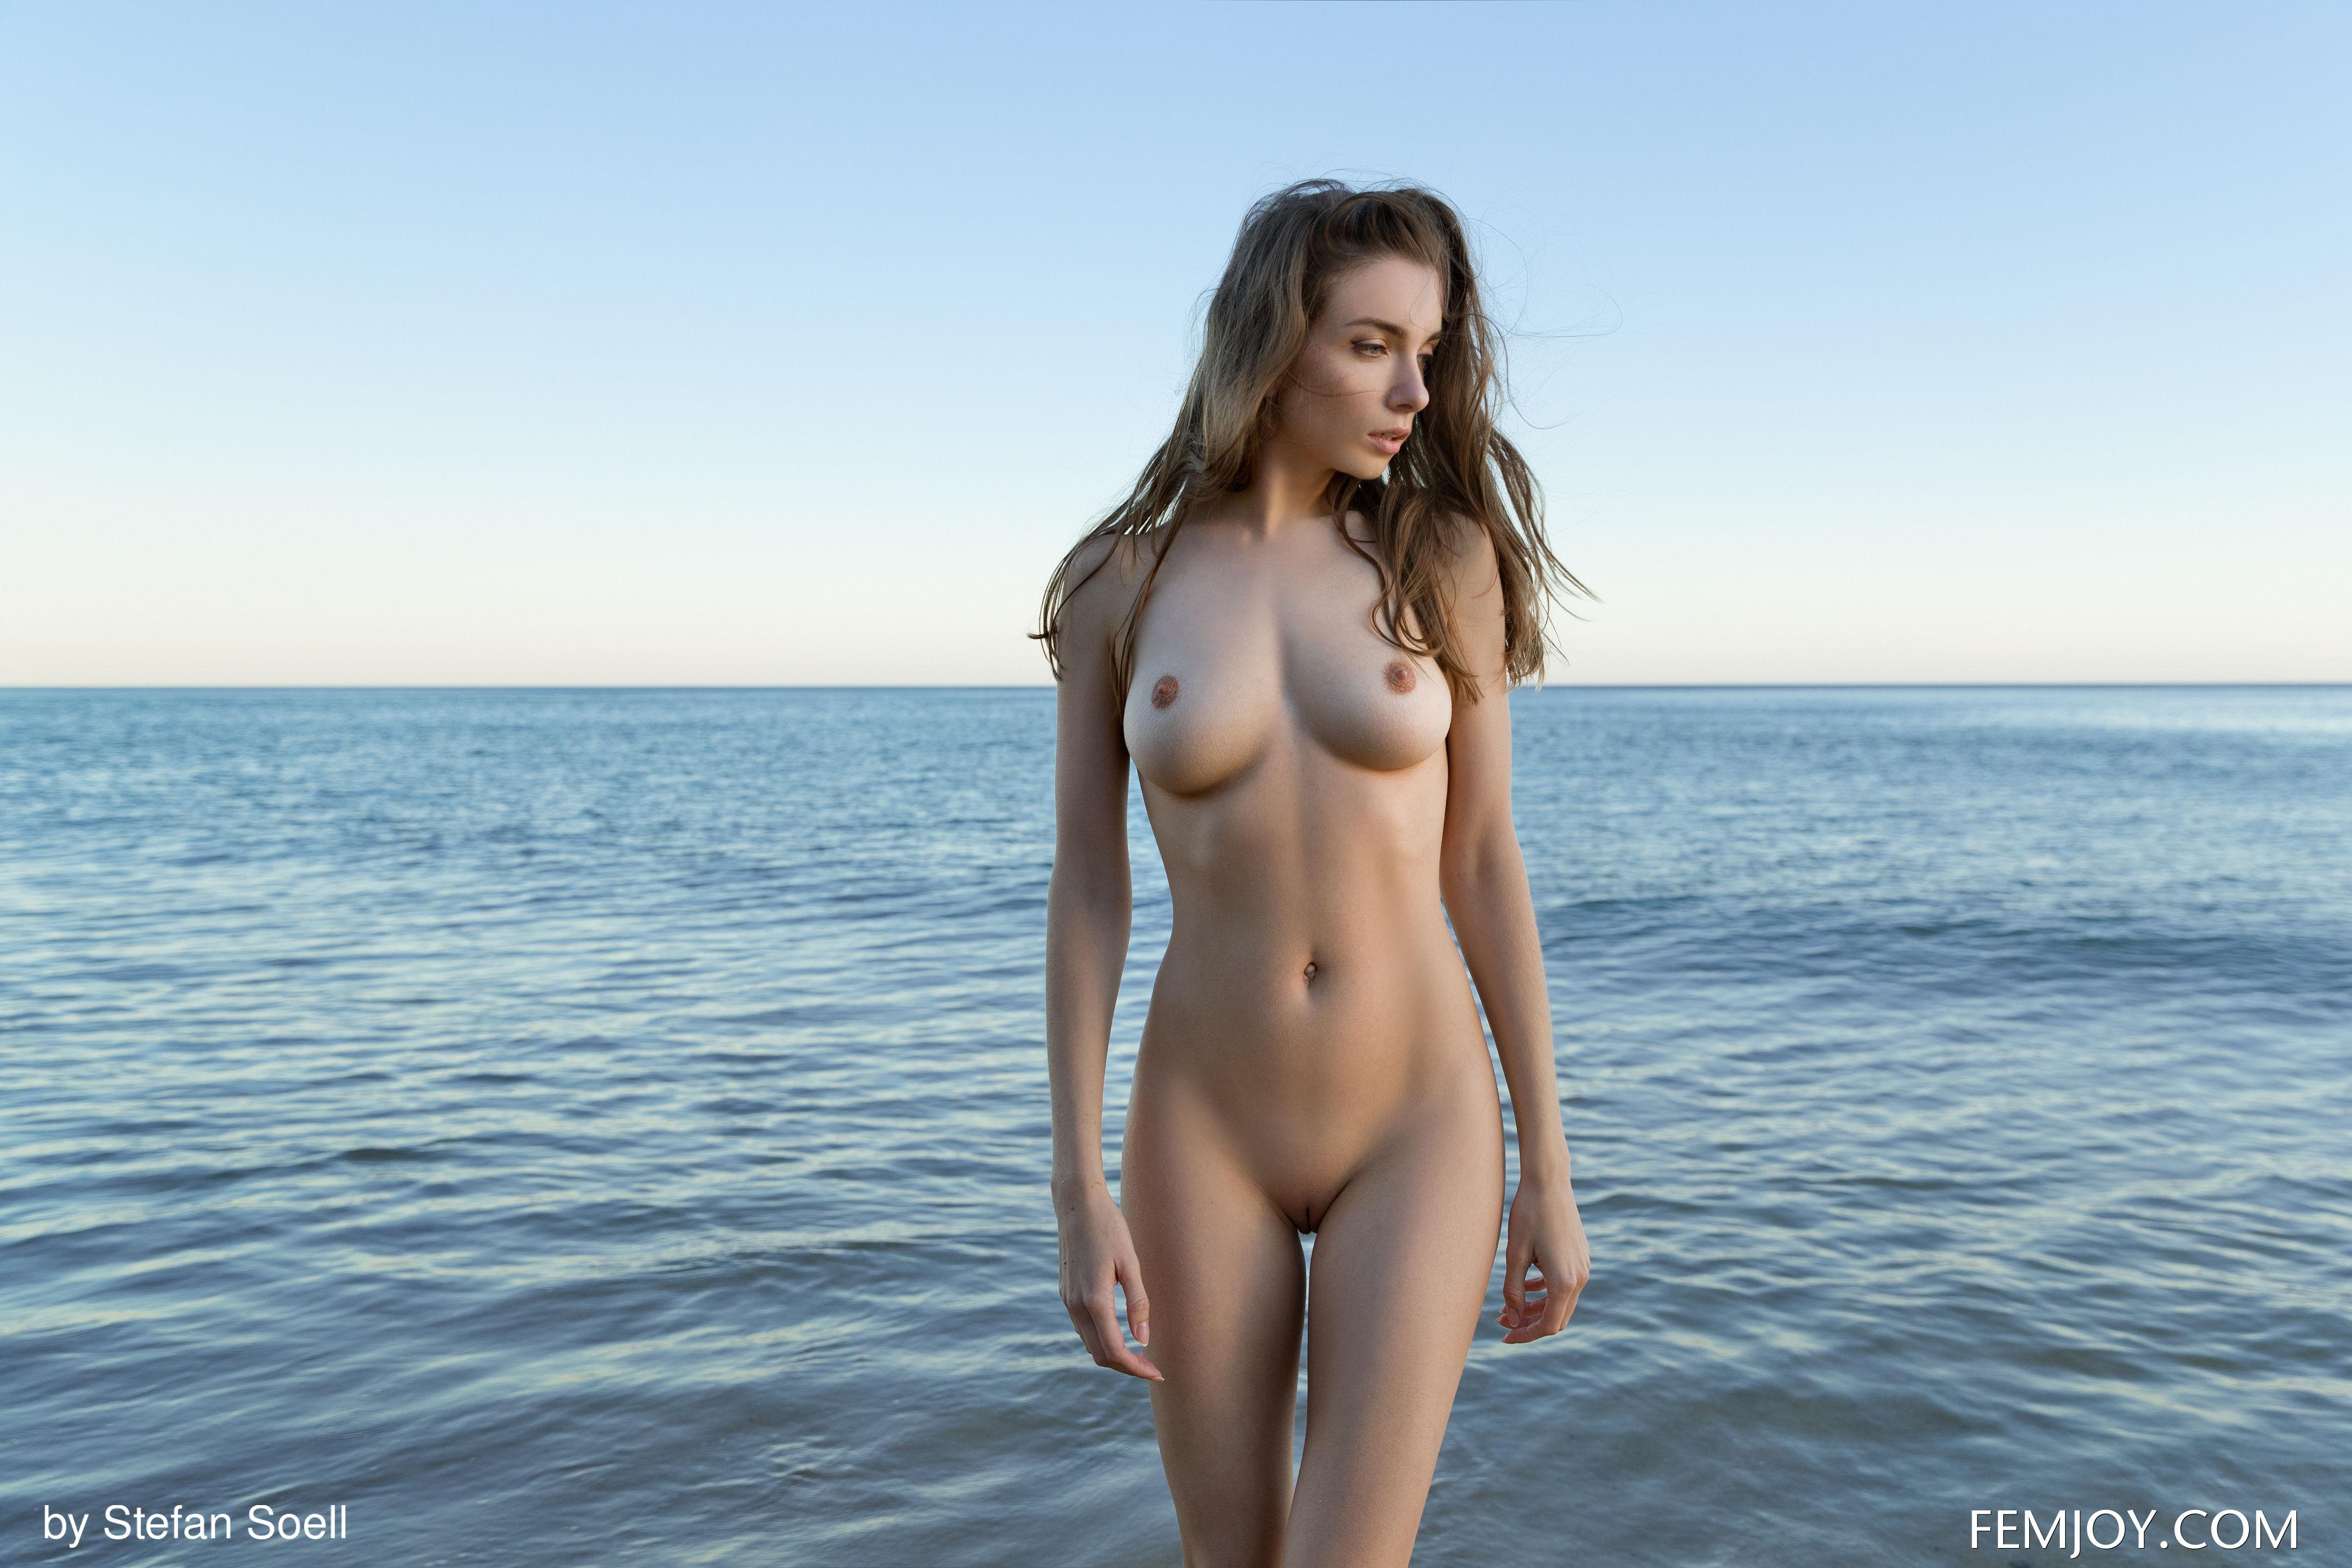 Thigh gap nude